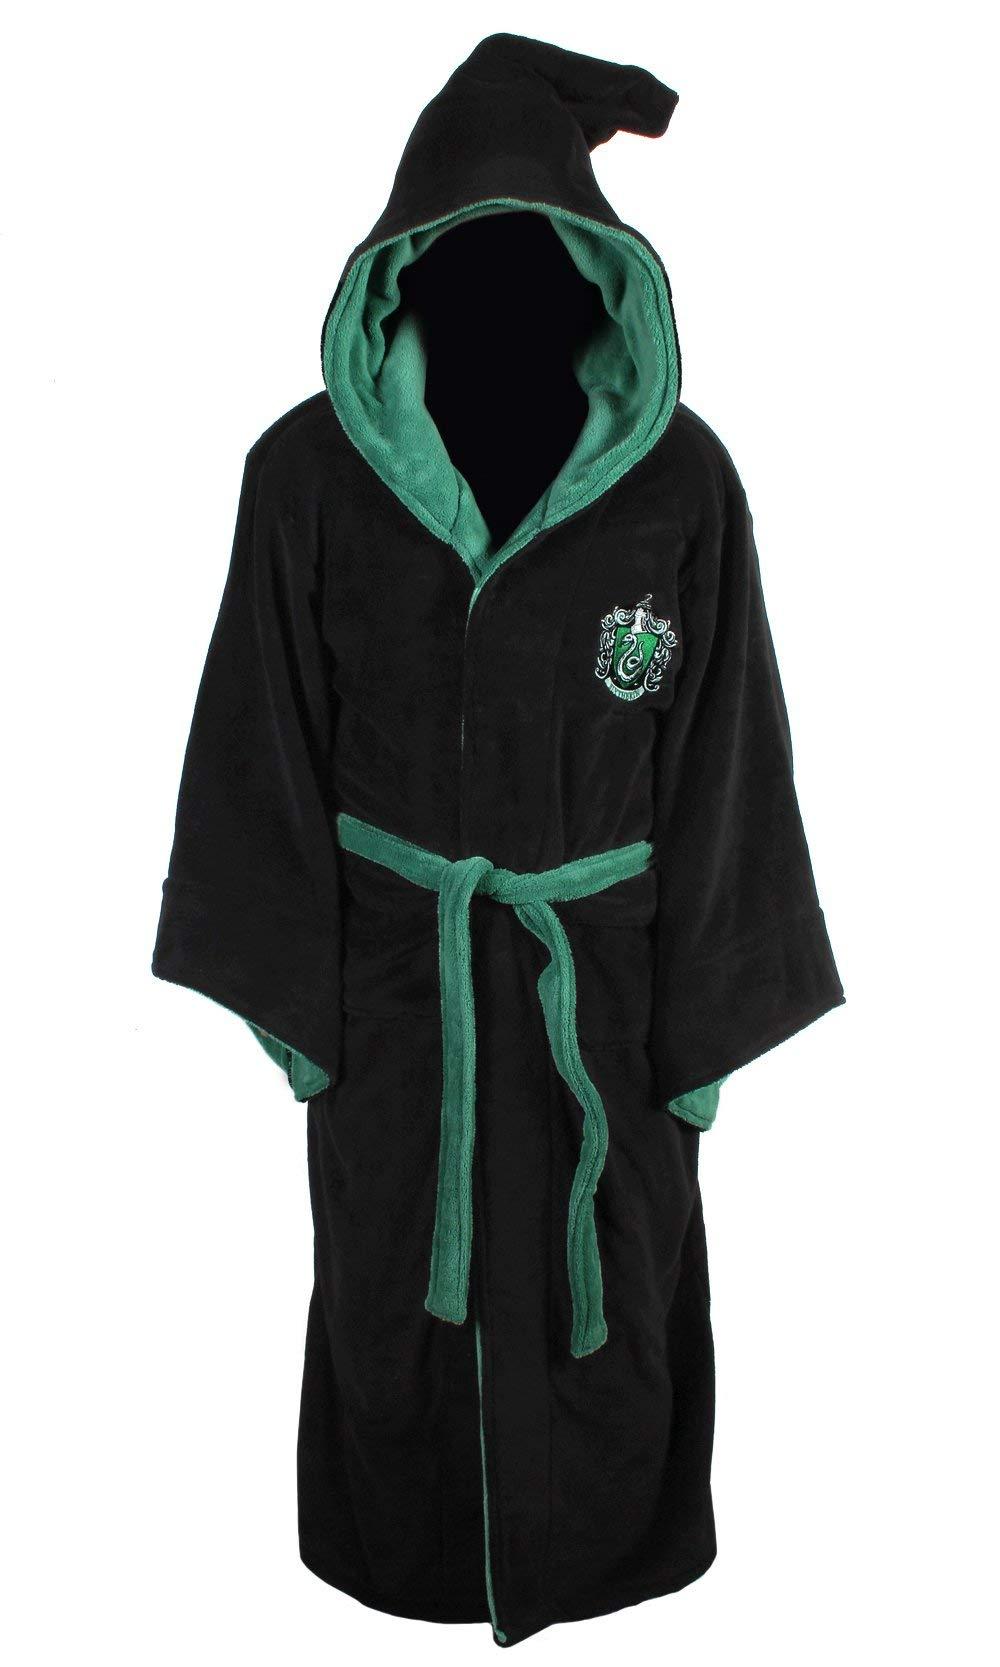 Oficial Harry Potter Hogwarts Slytherin asistente paño grueso y suave bata albornoz product image